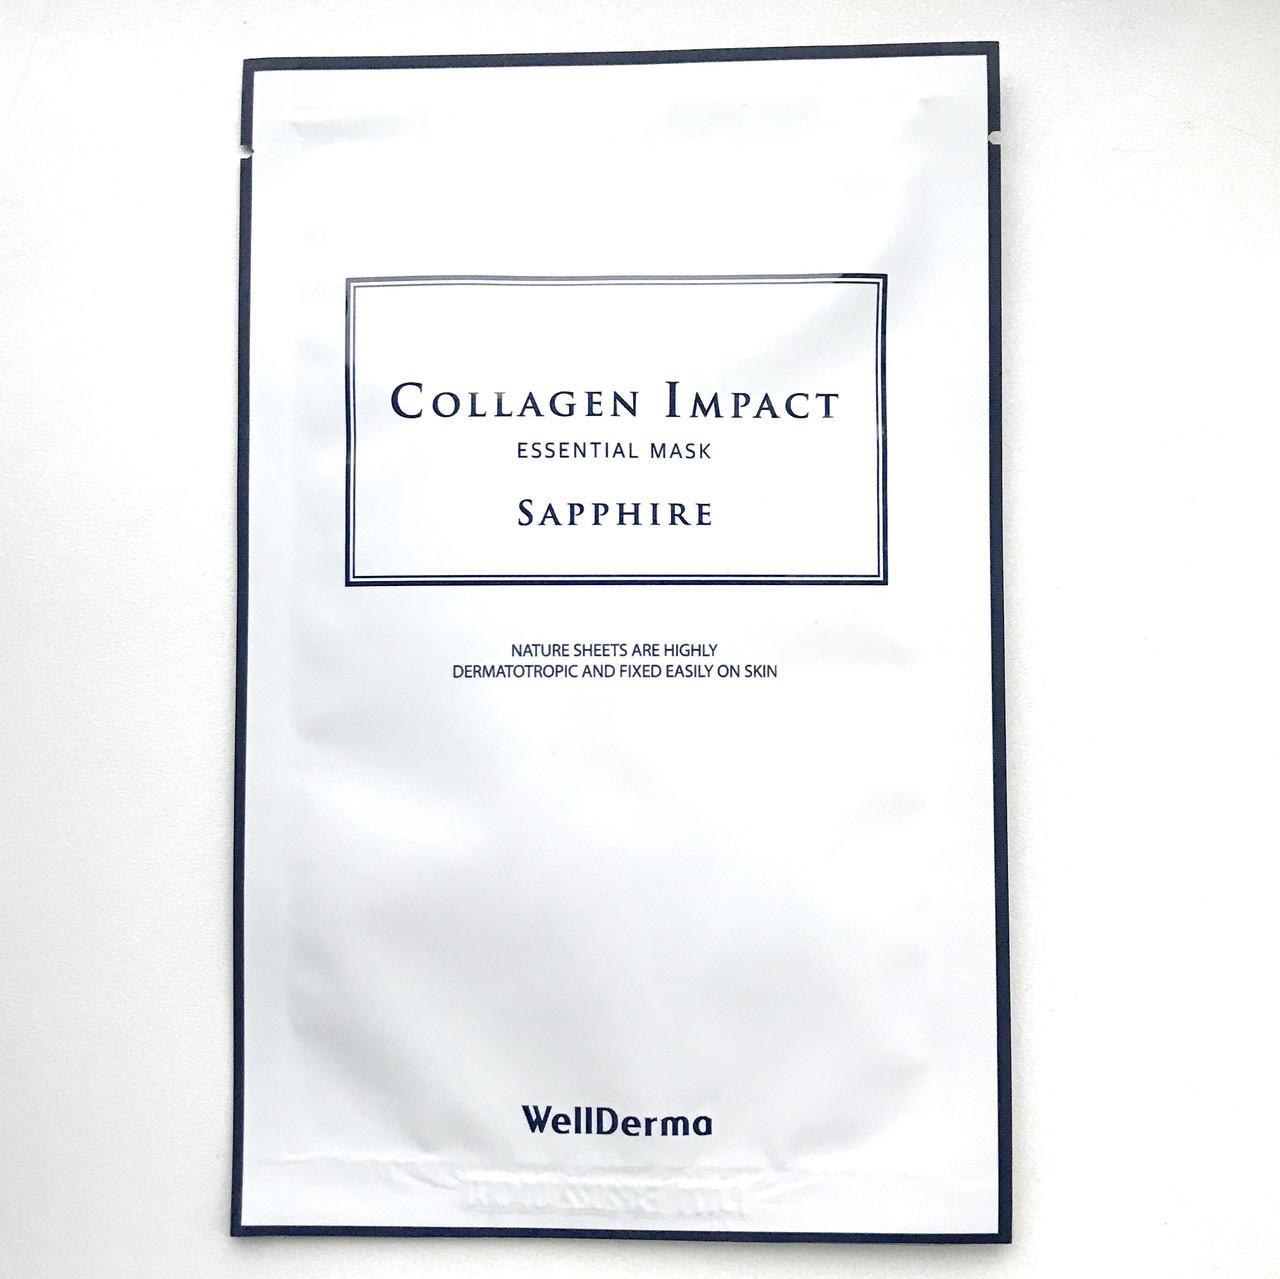 Тканевая маска с коллагеном, оживляющая кожу WellDerma Collagen Impact Essential Mask Sapphire